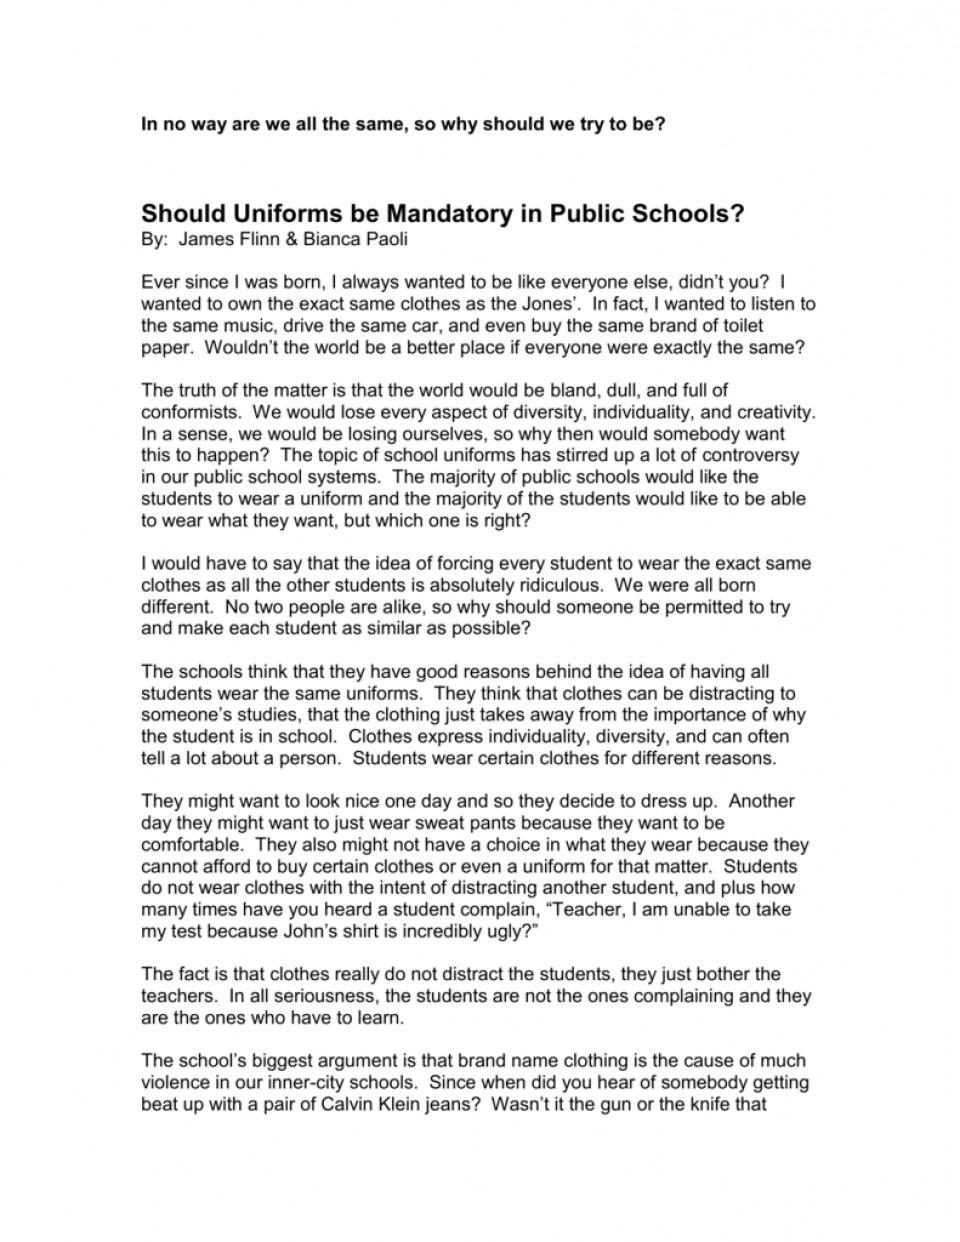 Education should not be compulsory argumentative essay